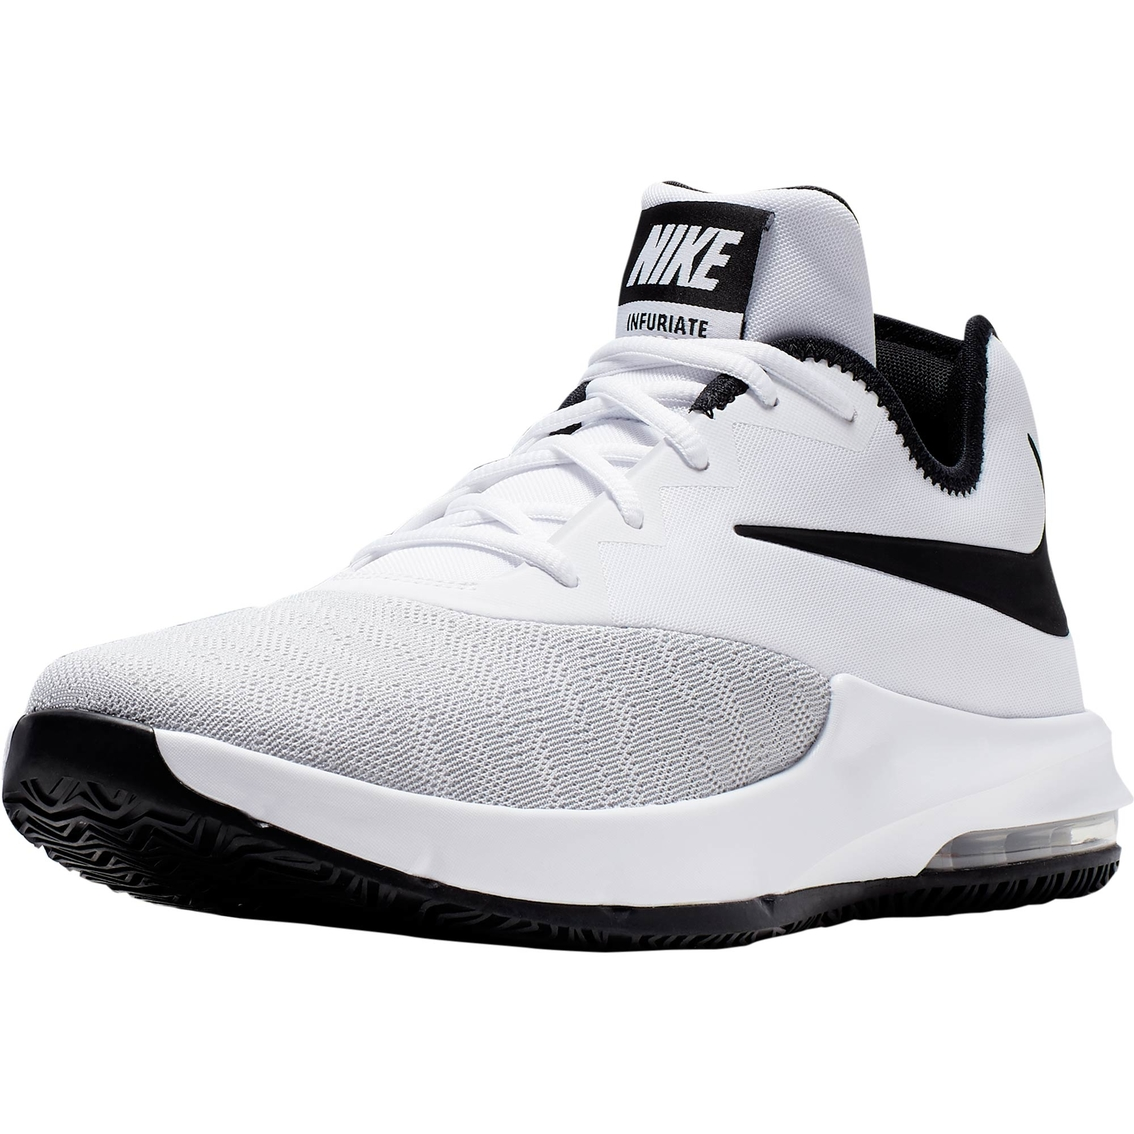 grande vente 74224 ff273 Nike Men's Air Max Infuriate Iii Low Top Shoes | Basketball ...